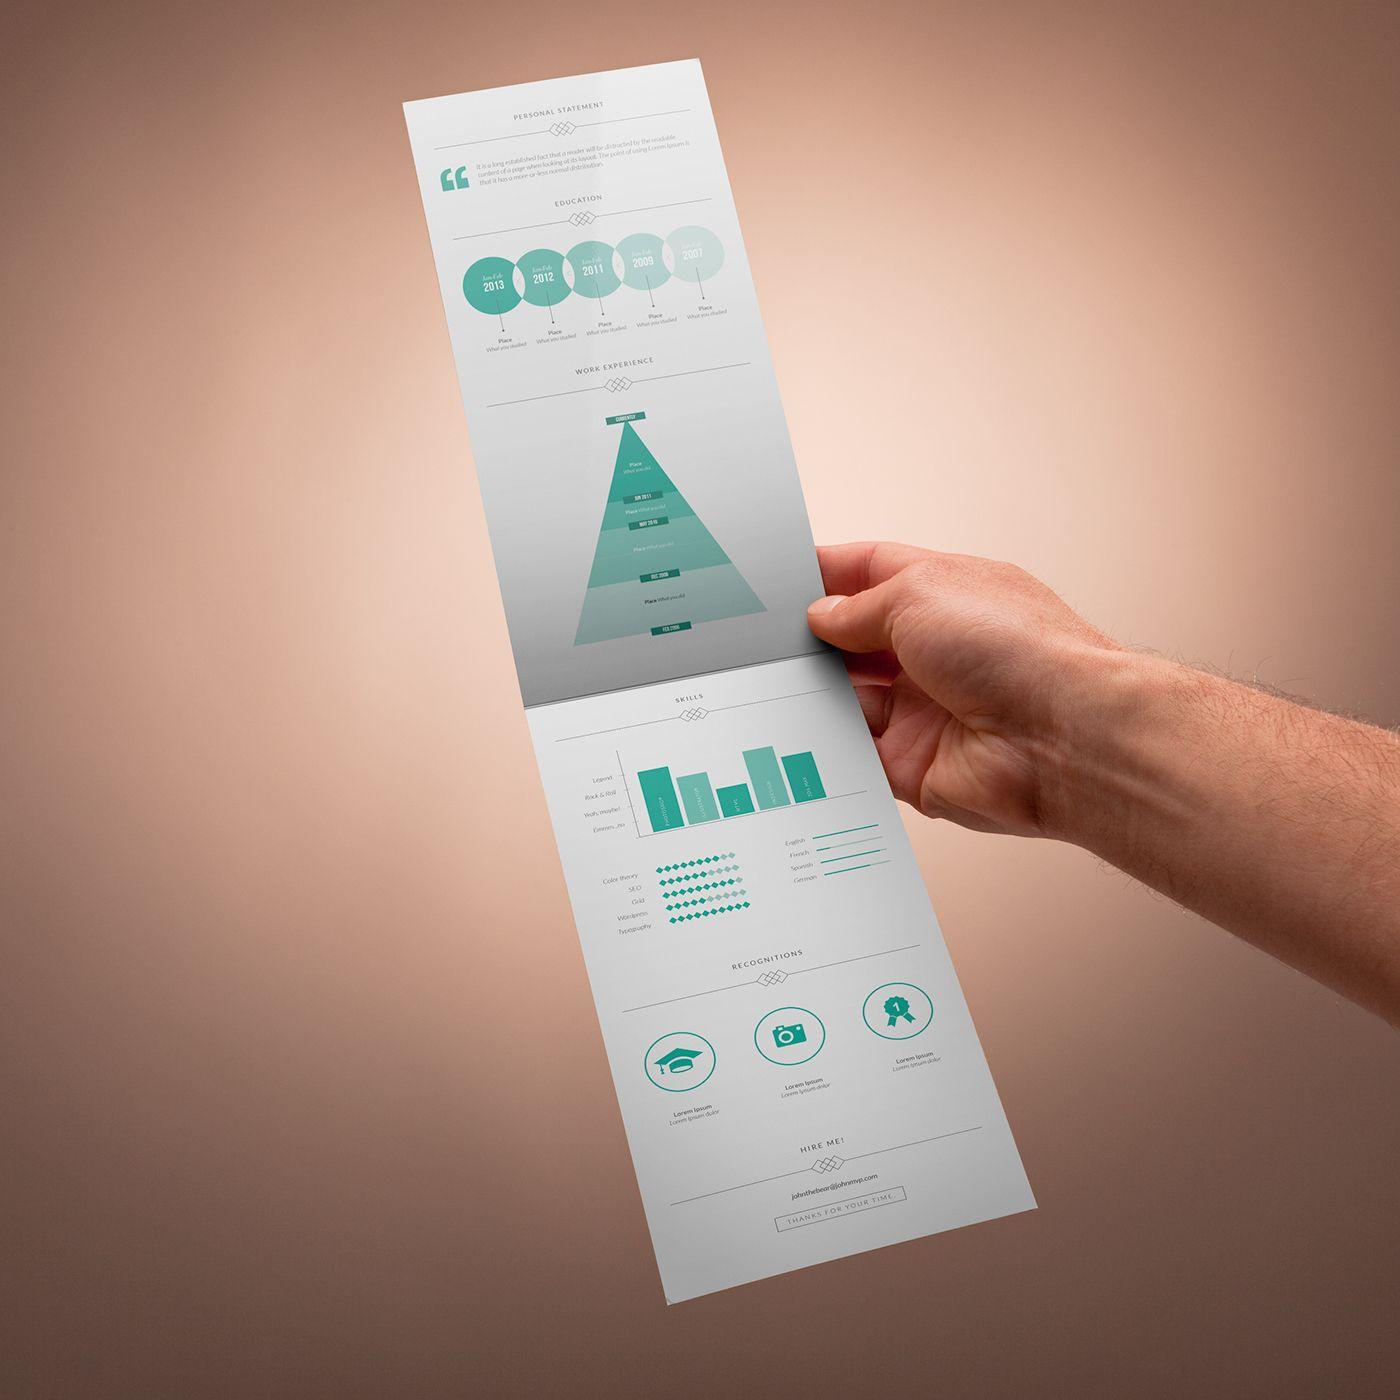 Free Resume Templates And Printing Freebie  Vertical Resume Template Cv  Pinterest  Template